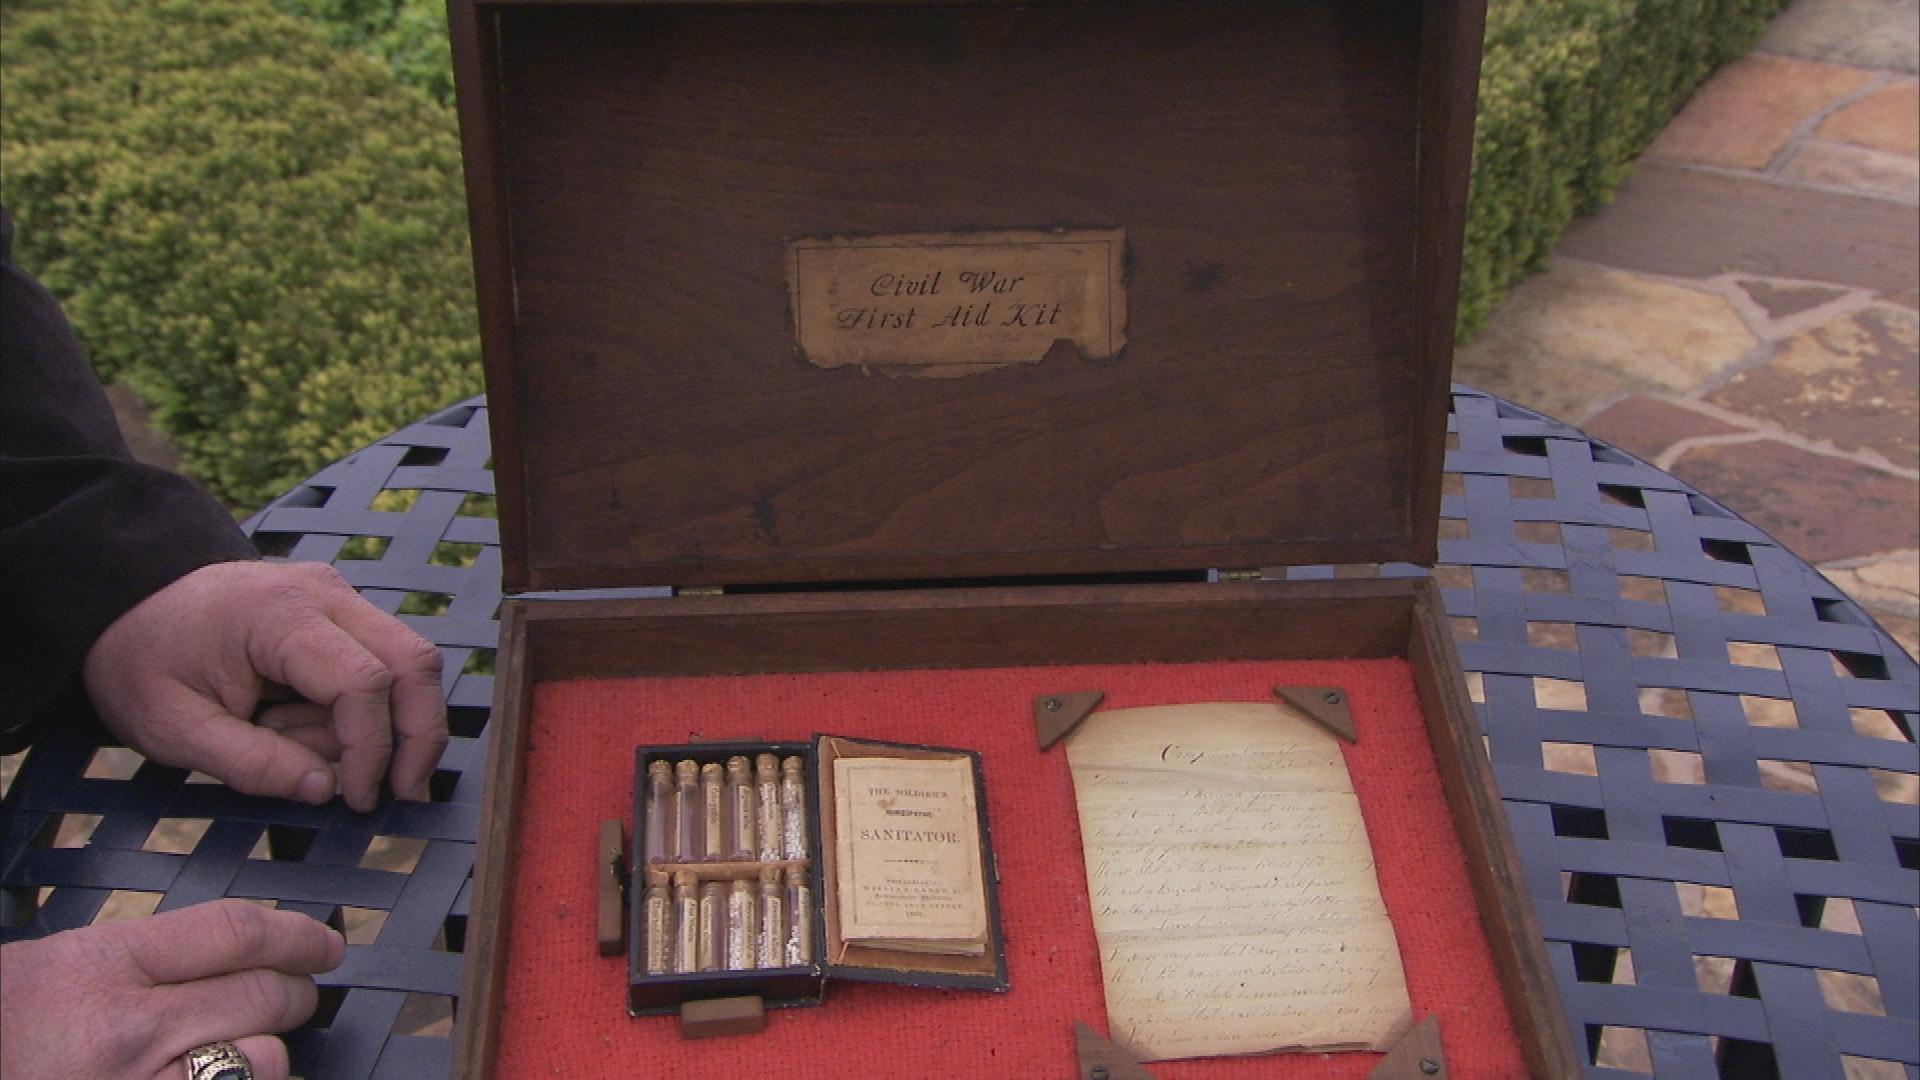 Appraisal: Civil War Medical Kit